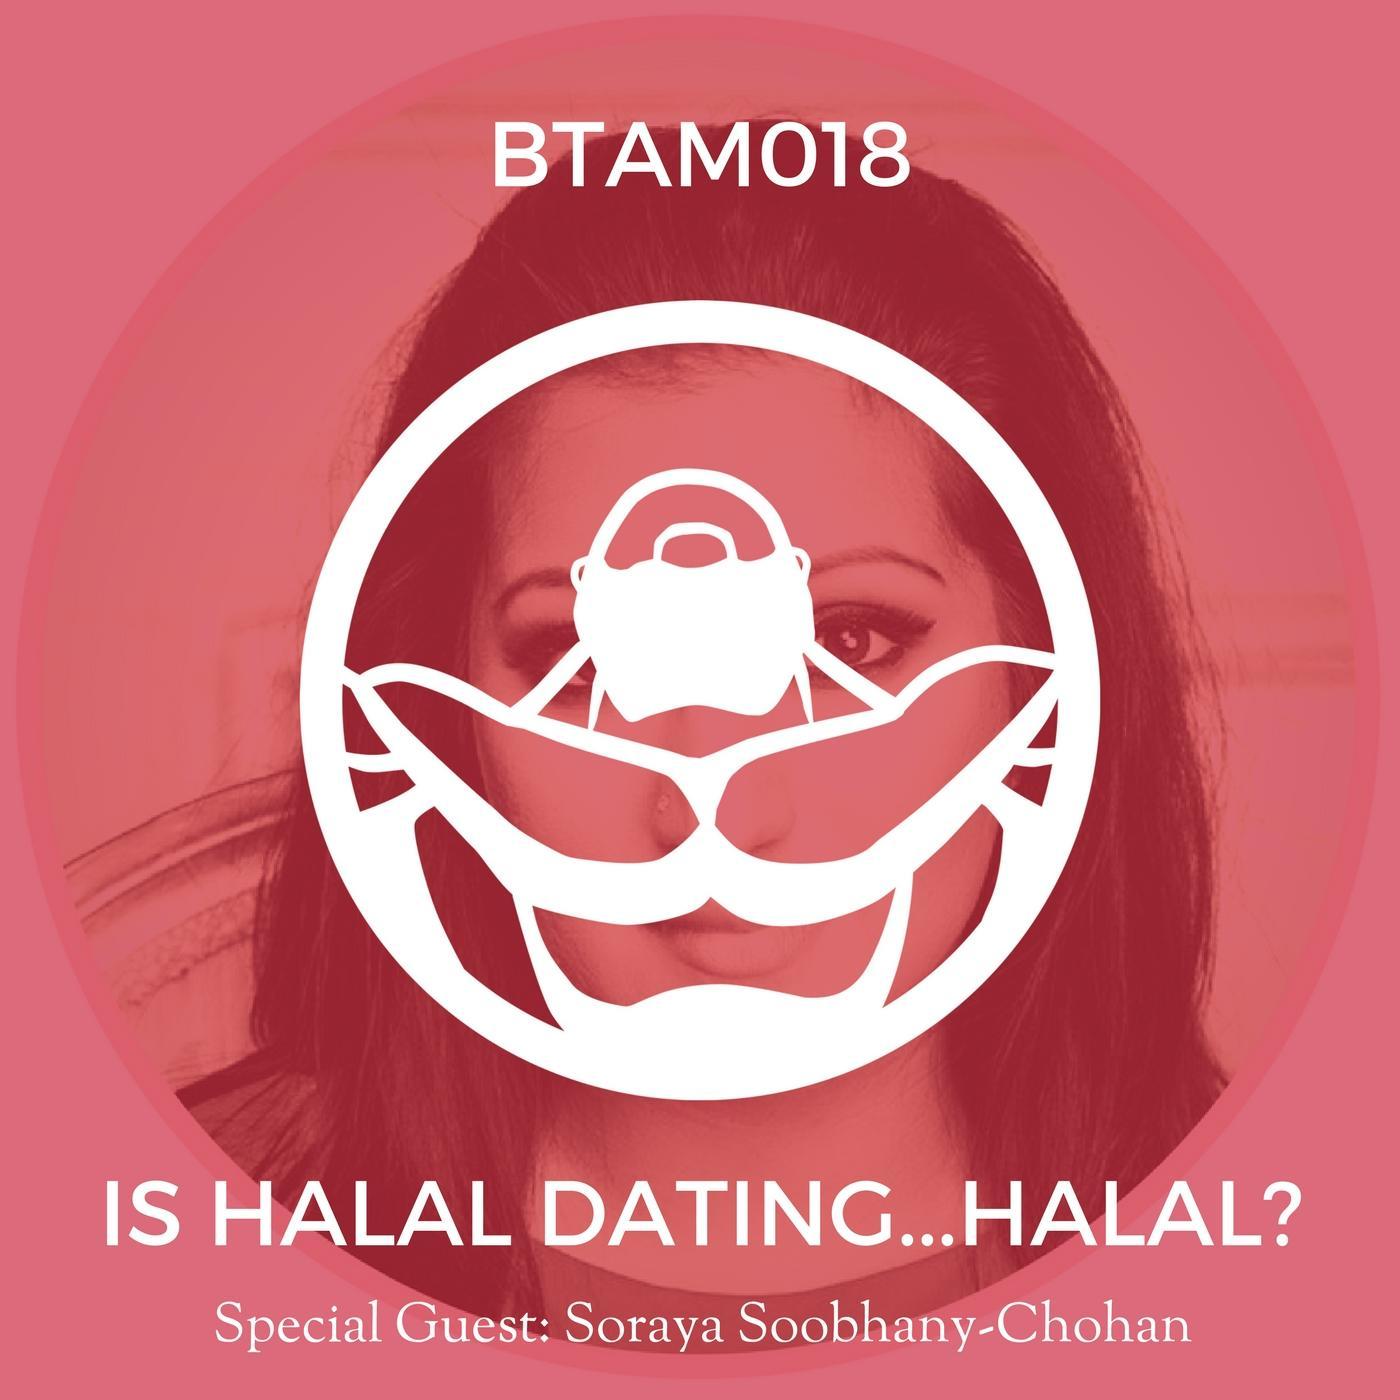 Is Halal Dating   Halal? (Special Guest: Soraya Soobhany Chohan)